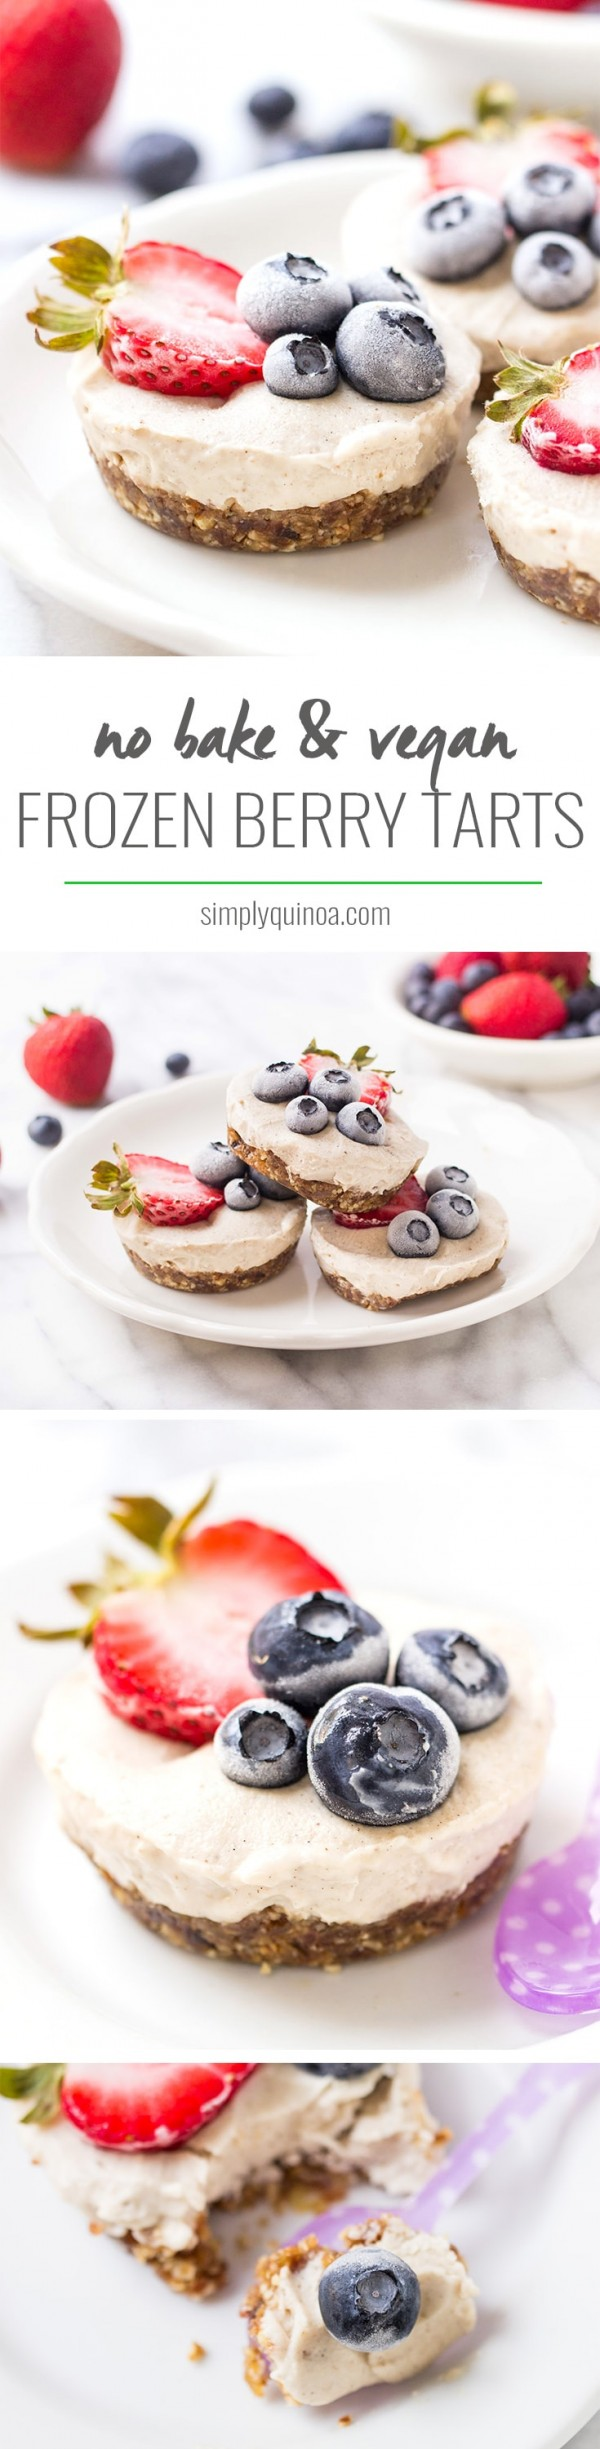 MINI VEGAN BERRY TARTS -- no-bake, healthy and they actually taste like an ice cream cake!